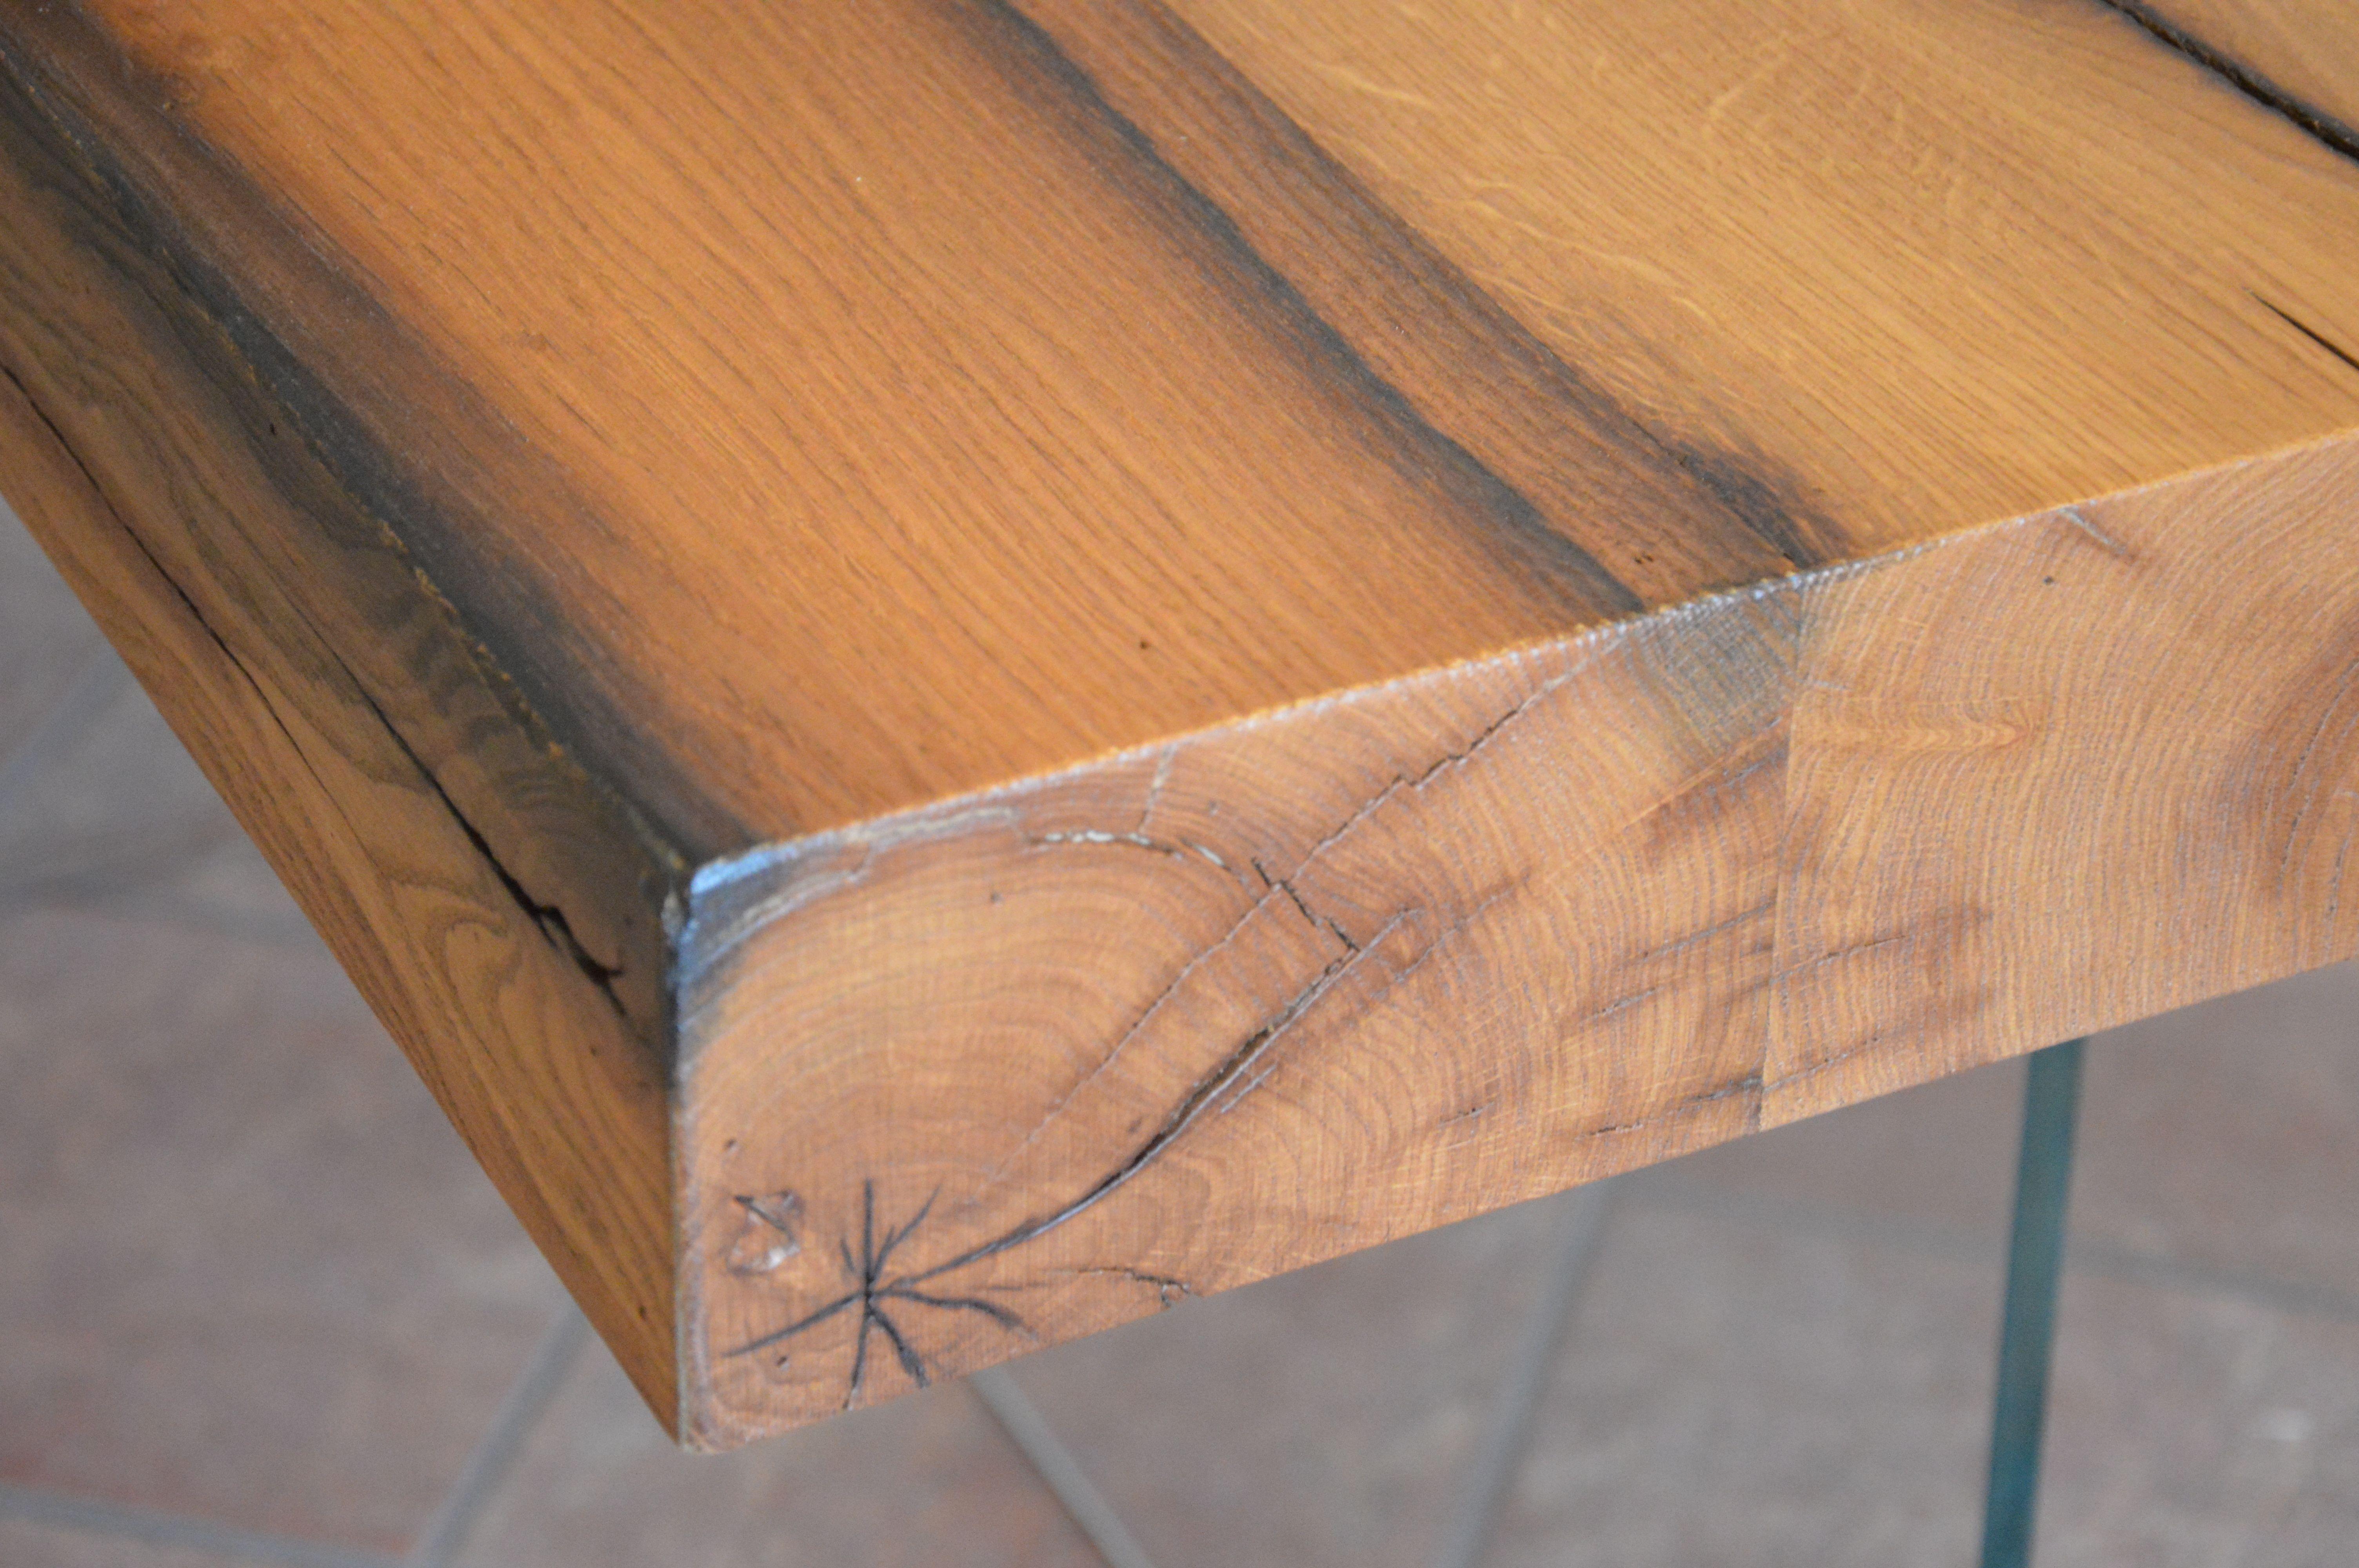 Tavoli In Legno E Vetro : Falegnameria bensi particolare tavolo legno e vetro tavoli in